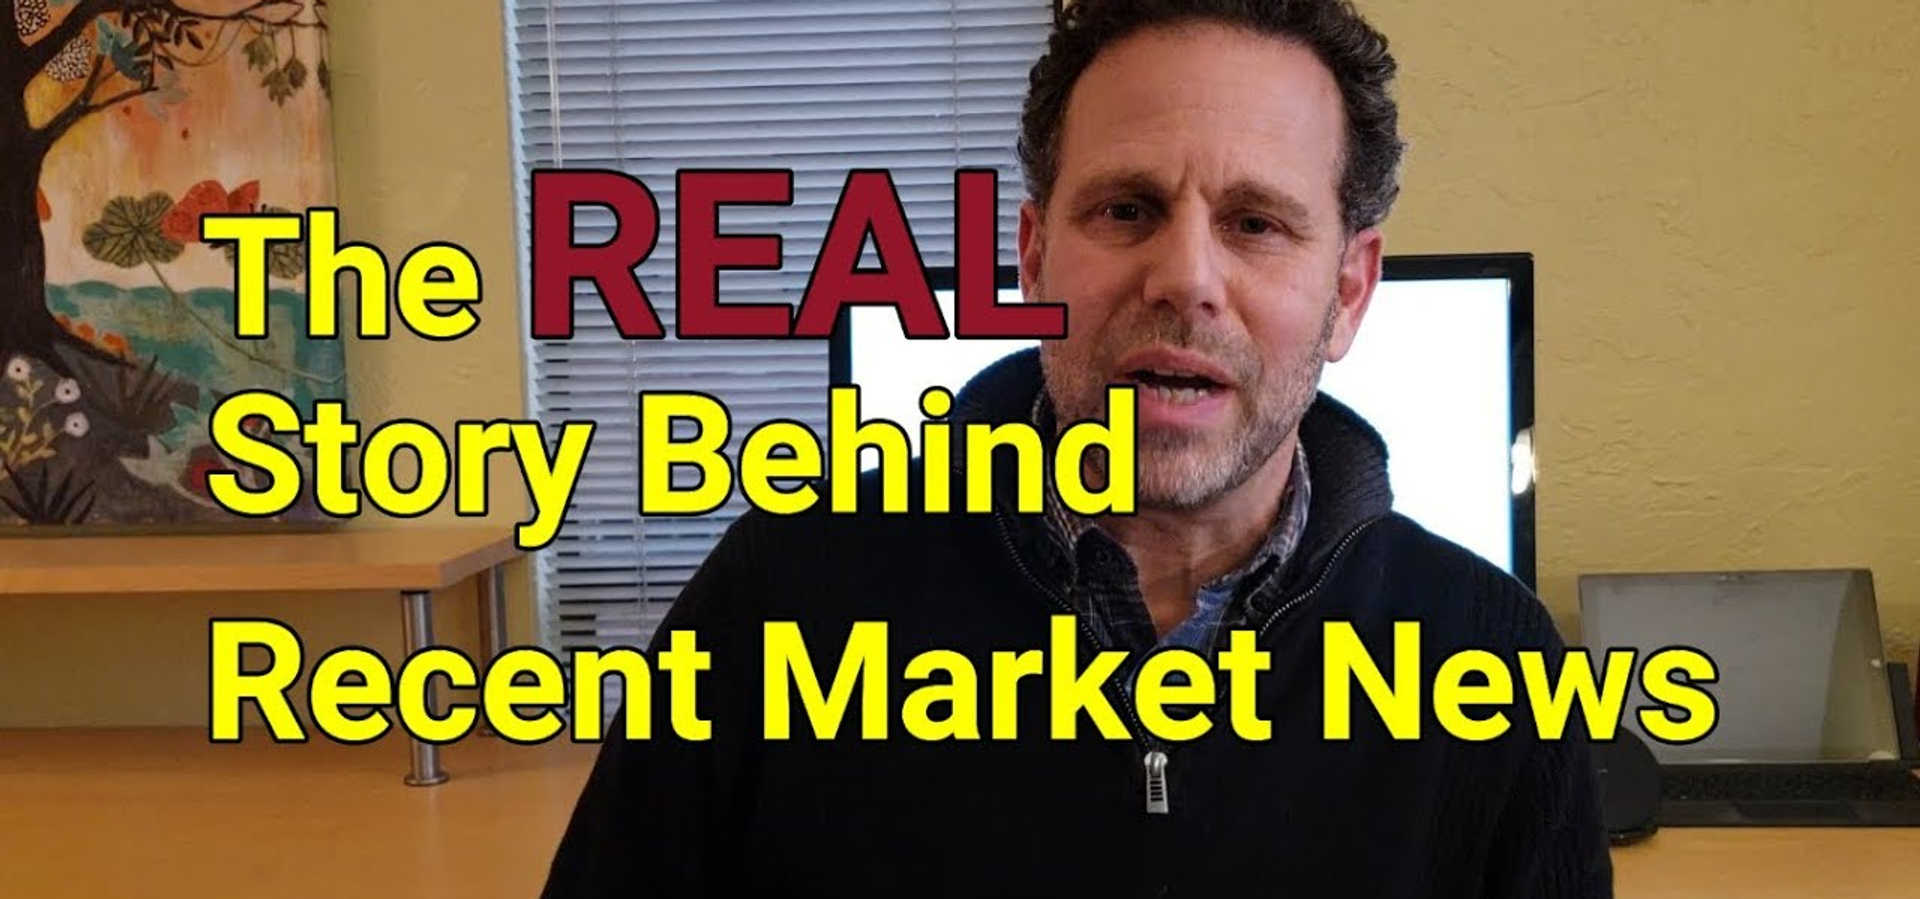 December 2018 Vlog: The REAL Story Behind Recent Market News